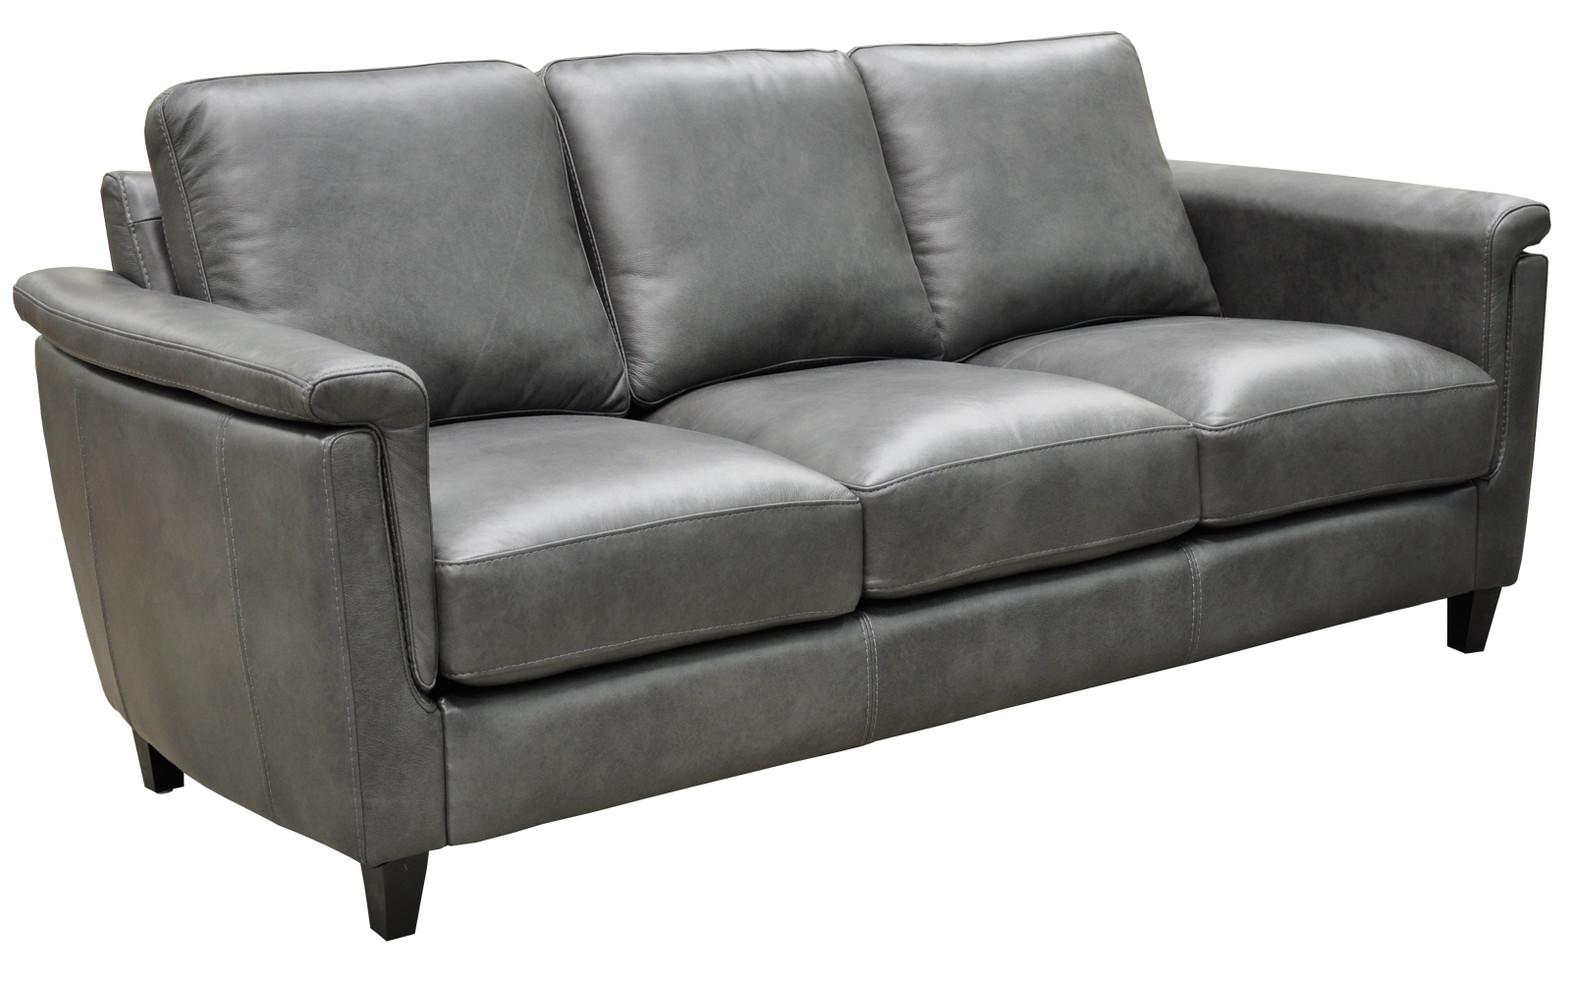 Ellis Leather Sofa